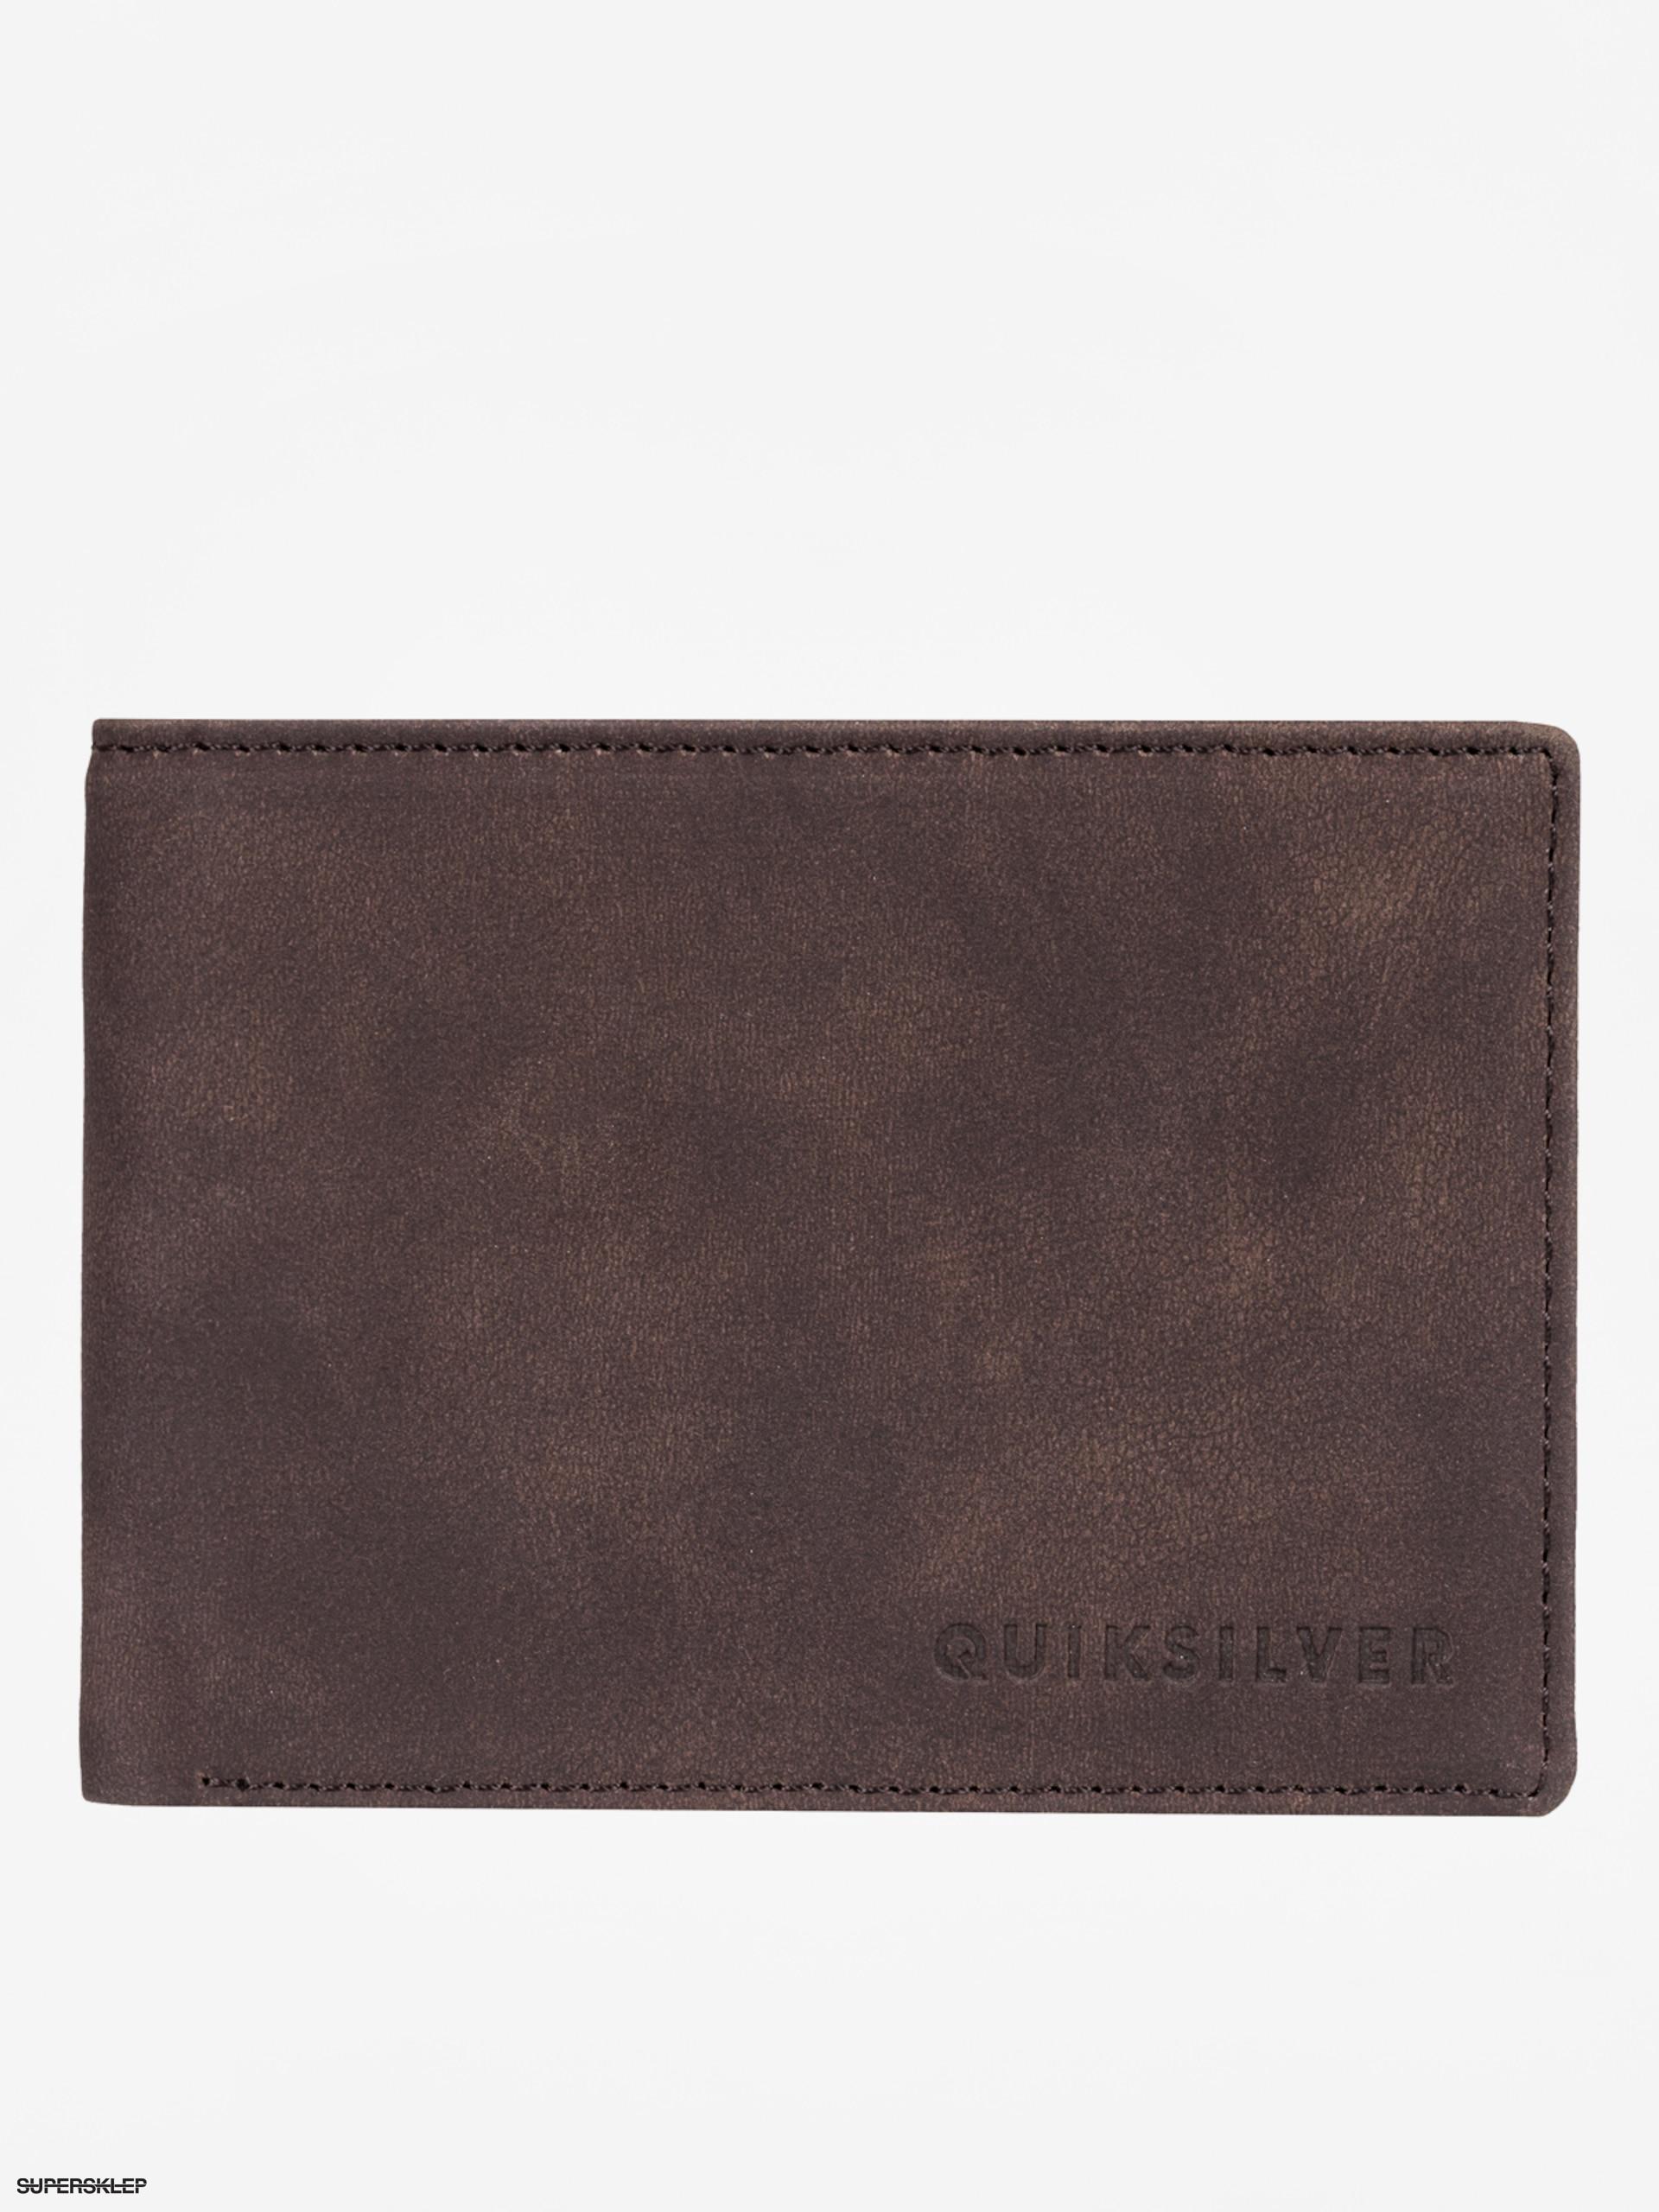 dcdbdb54a5f89 Portfel Quiksilver Slim Vintage (chocolate)